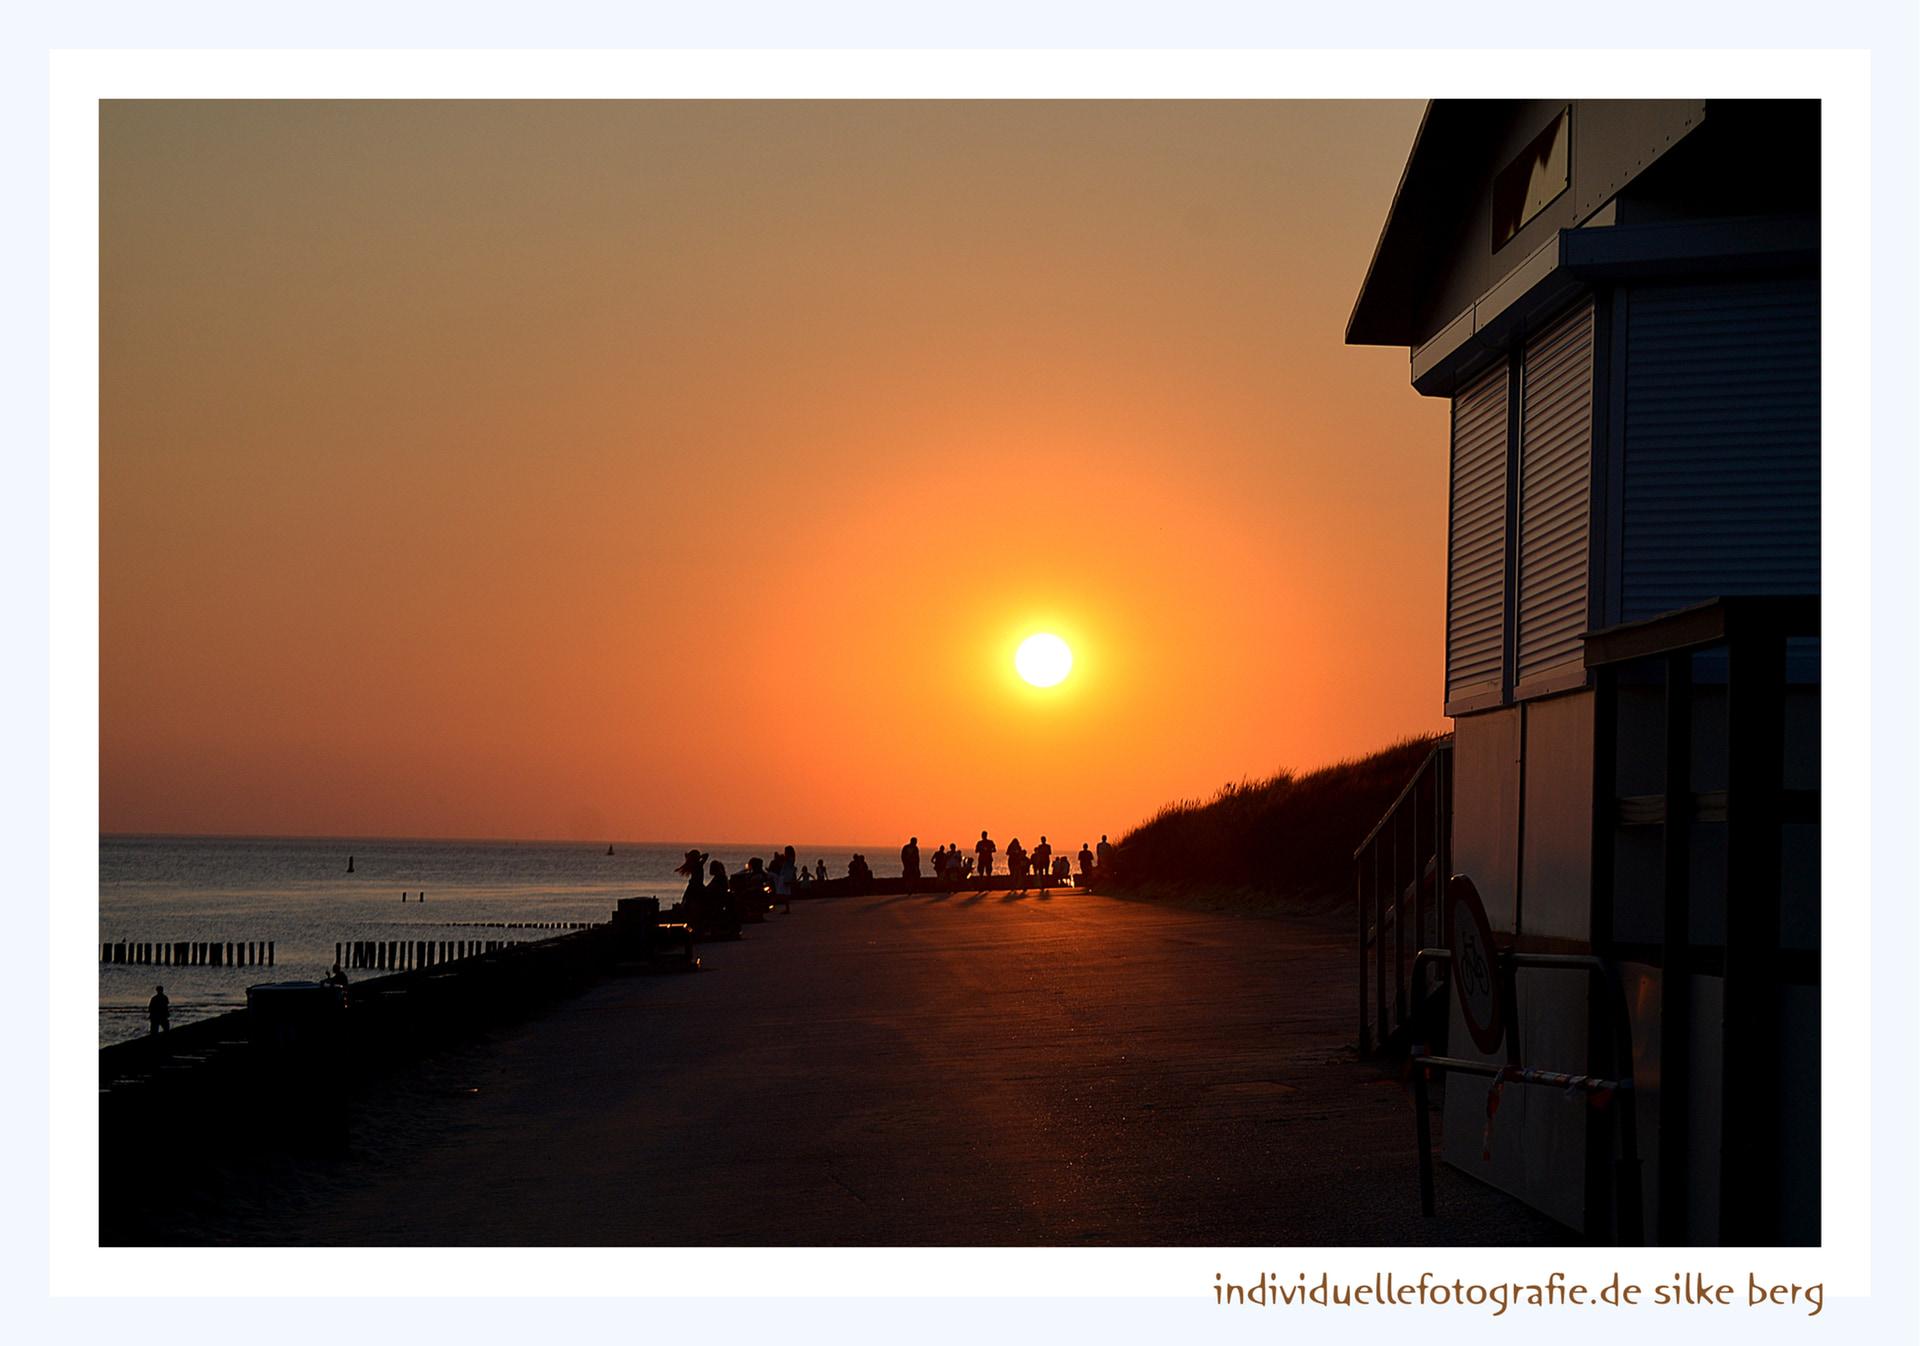 Sonnenuntergang, Meer, Nordsee, Menschen, Fotografien, Holland, Fotografin, Offenburg, Silke Berg